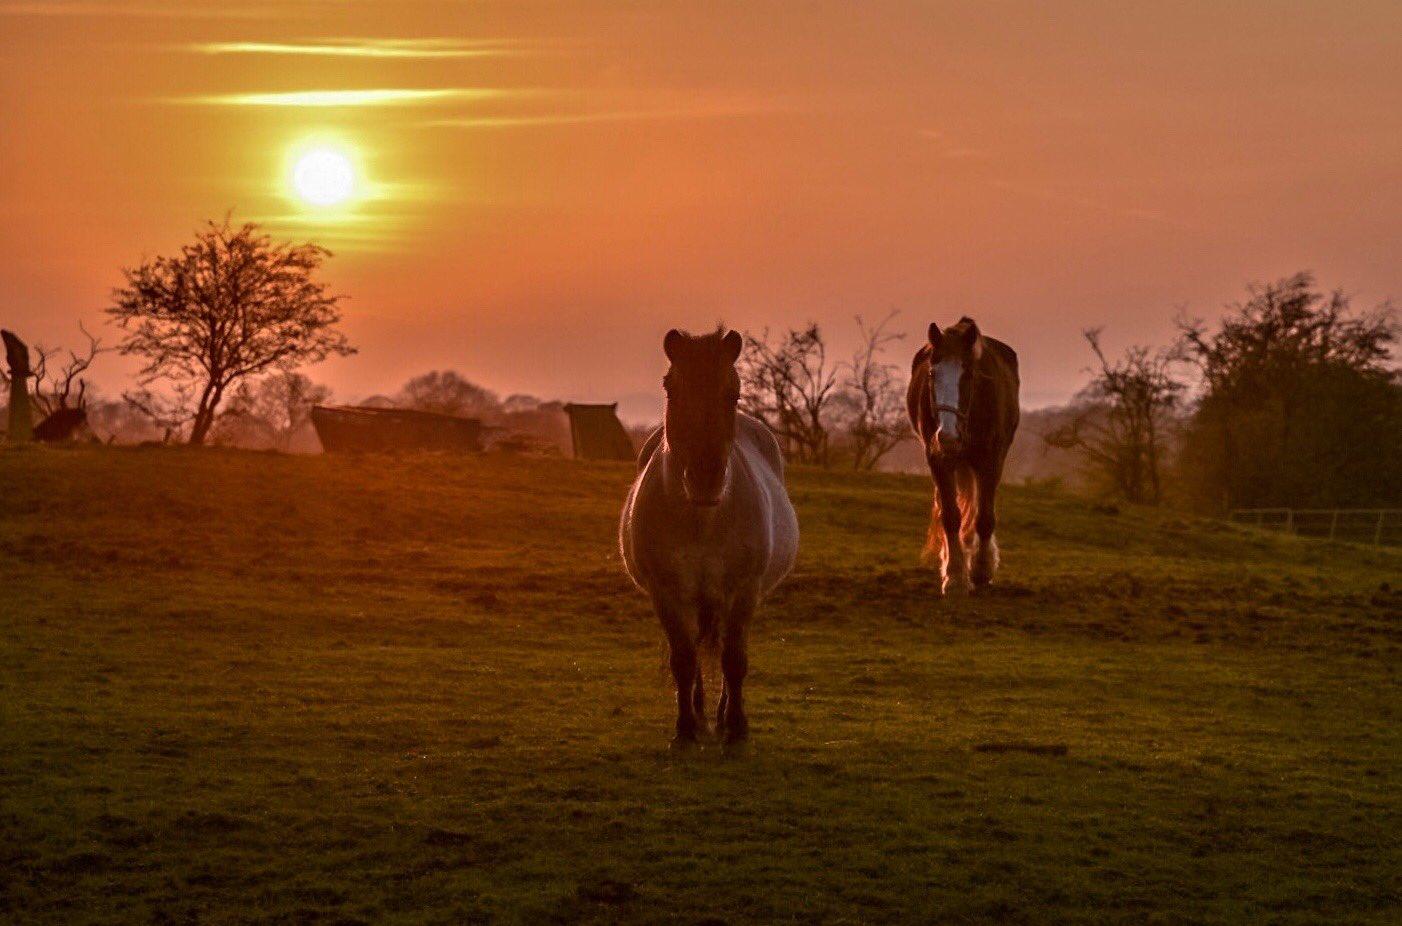 horse_wildlife_photography_22.jpg